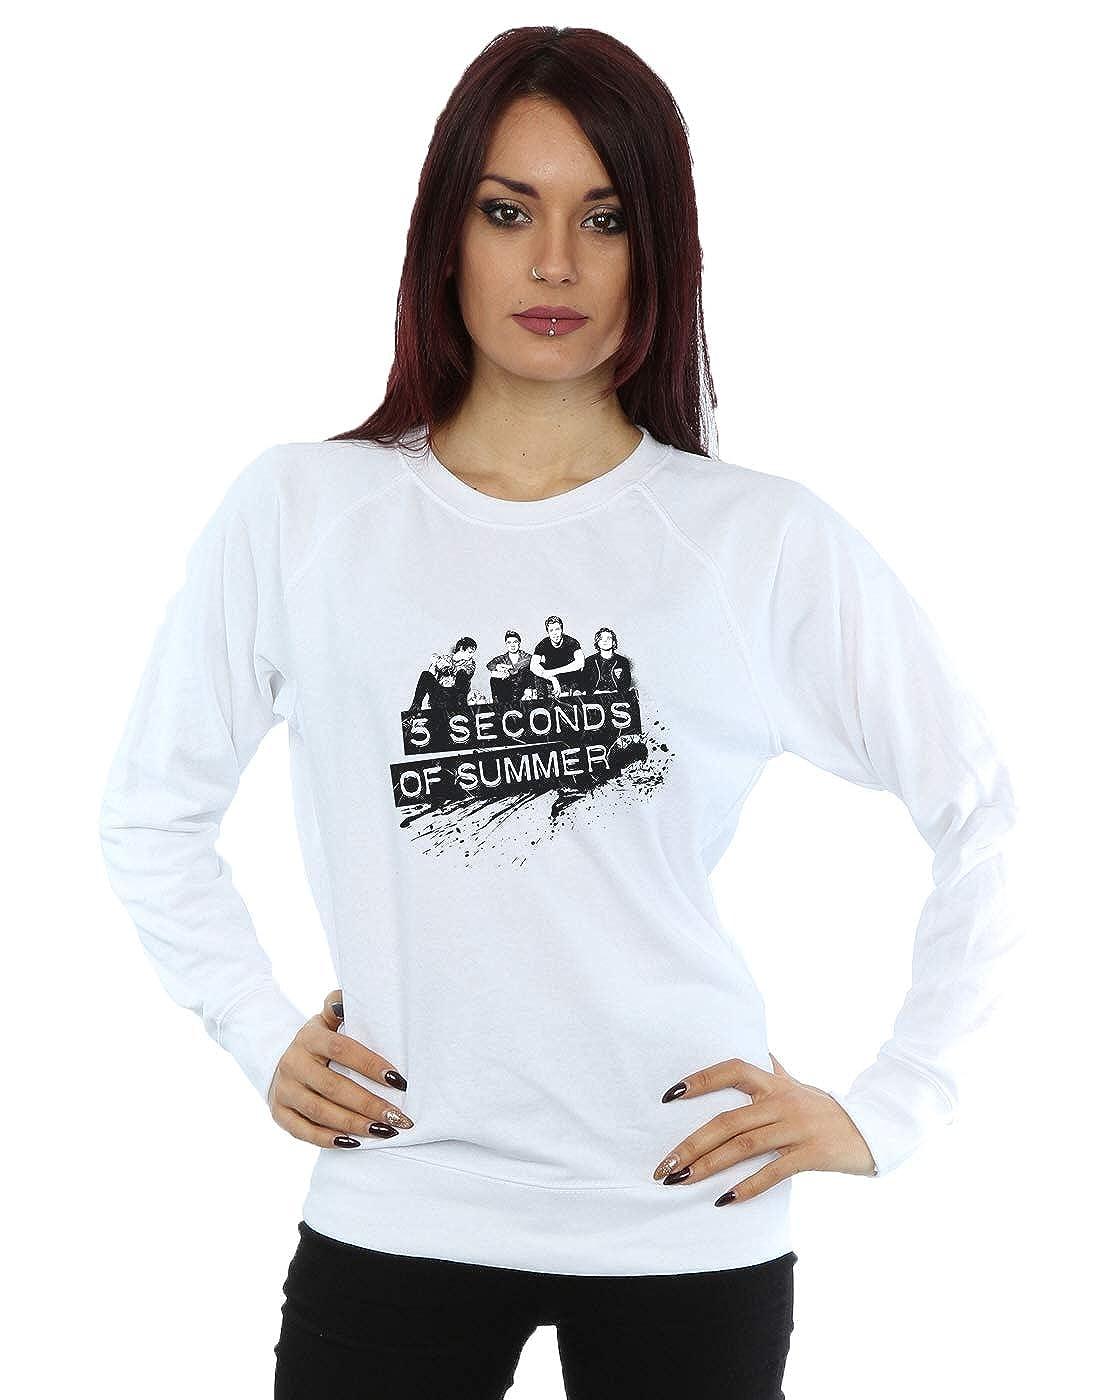 5 Seconds of Summer mujer Black Splatter Camisa de entrenamiento